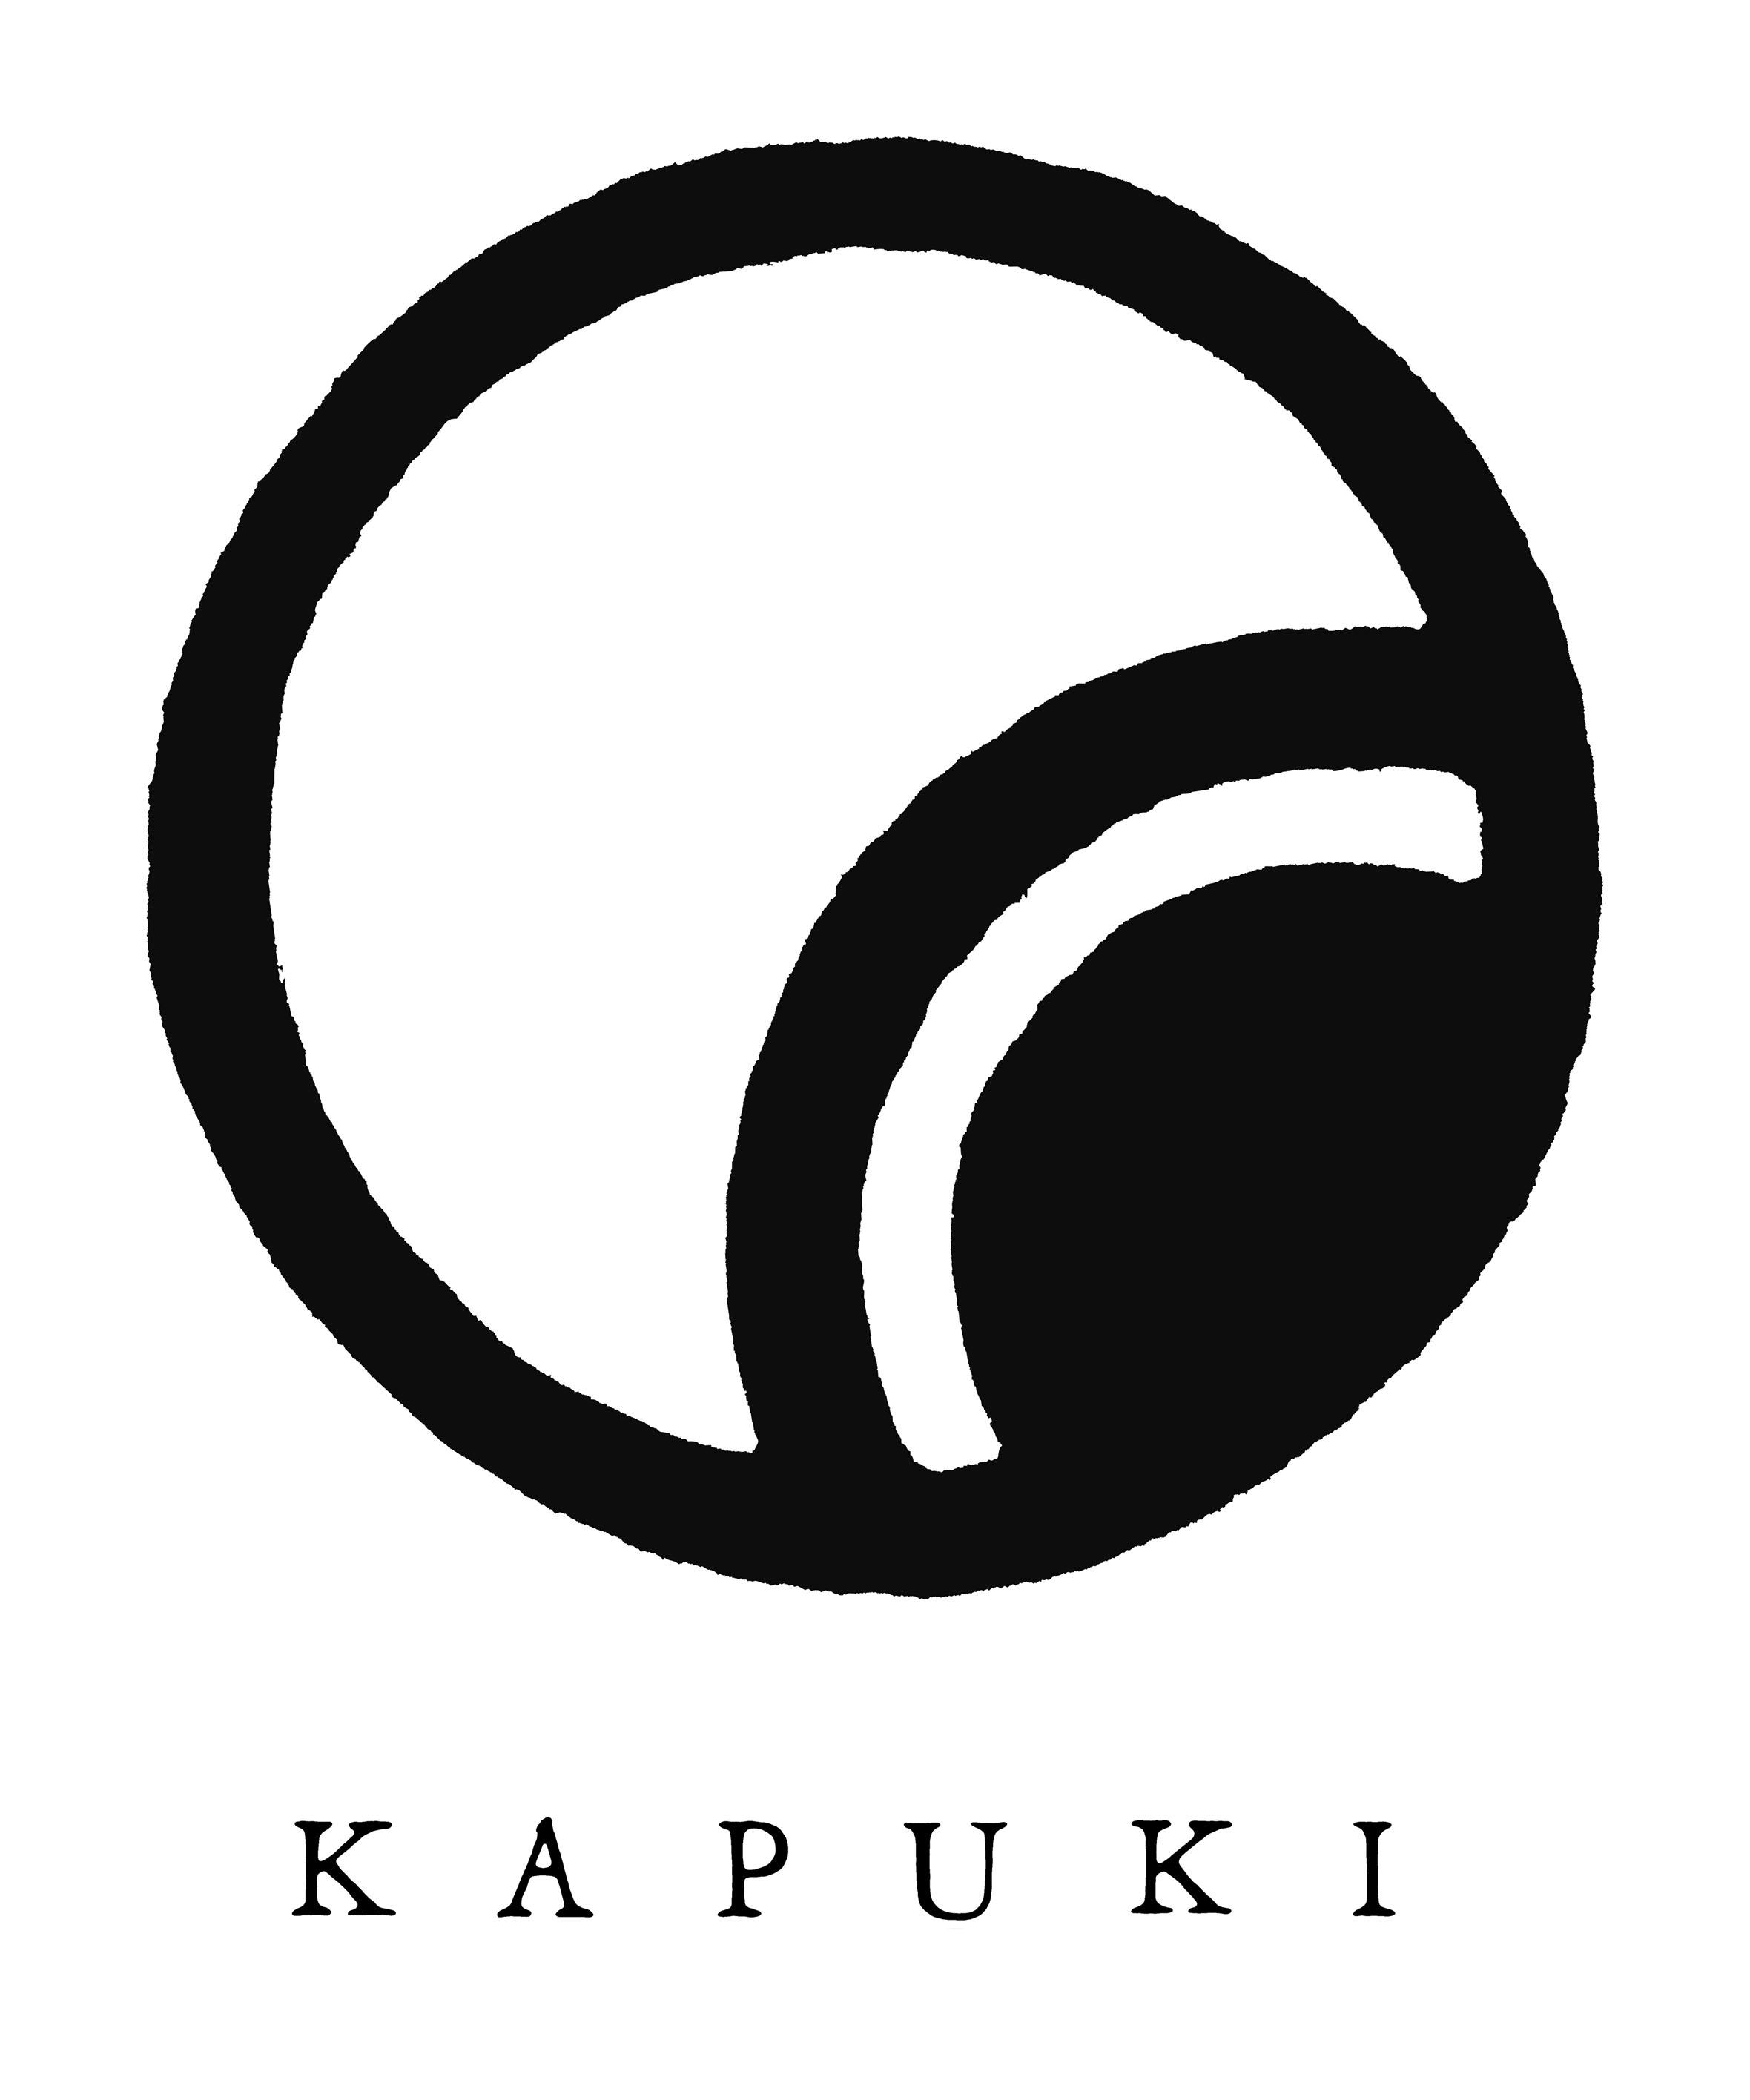 kapuki-logotype_%e8%a5%bf%e5%b2%a1%e3%83%9a%e3%83%b3%e3%82%b7%e3%83%ab